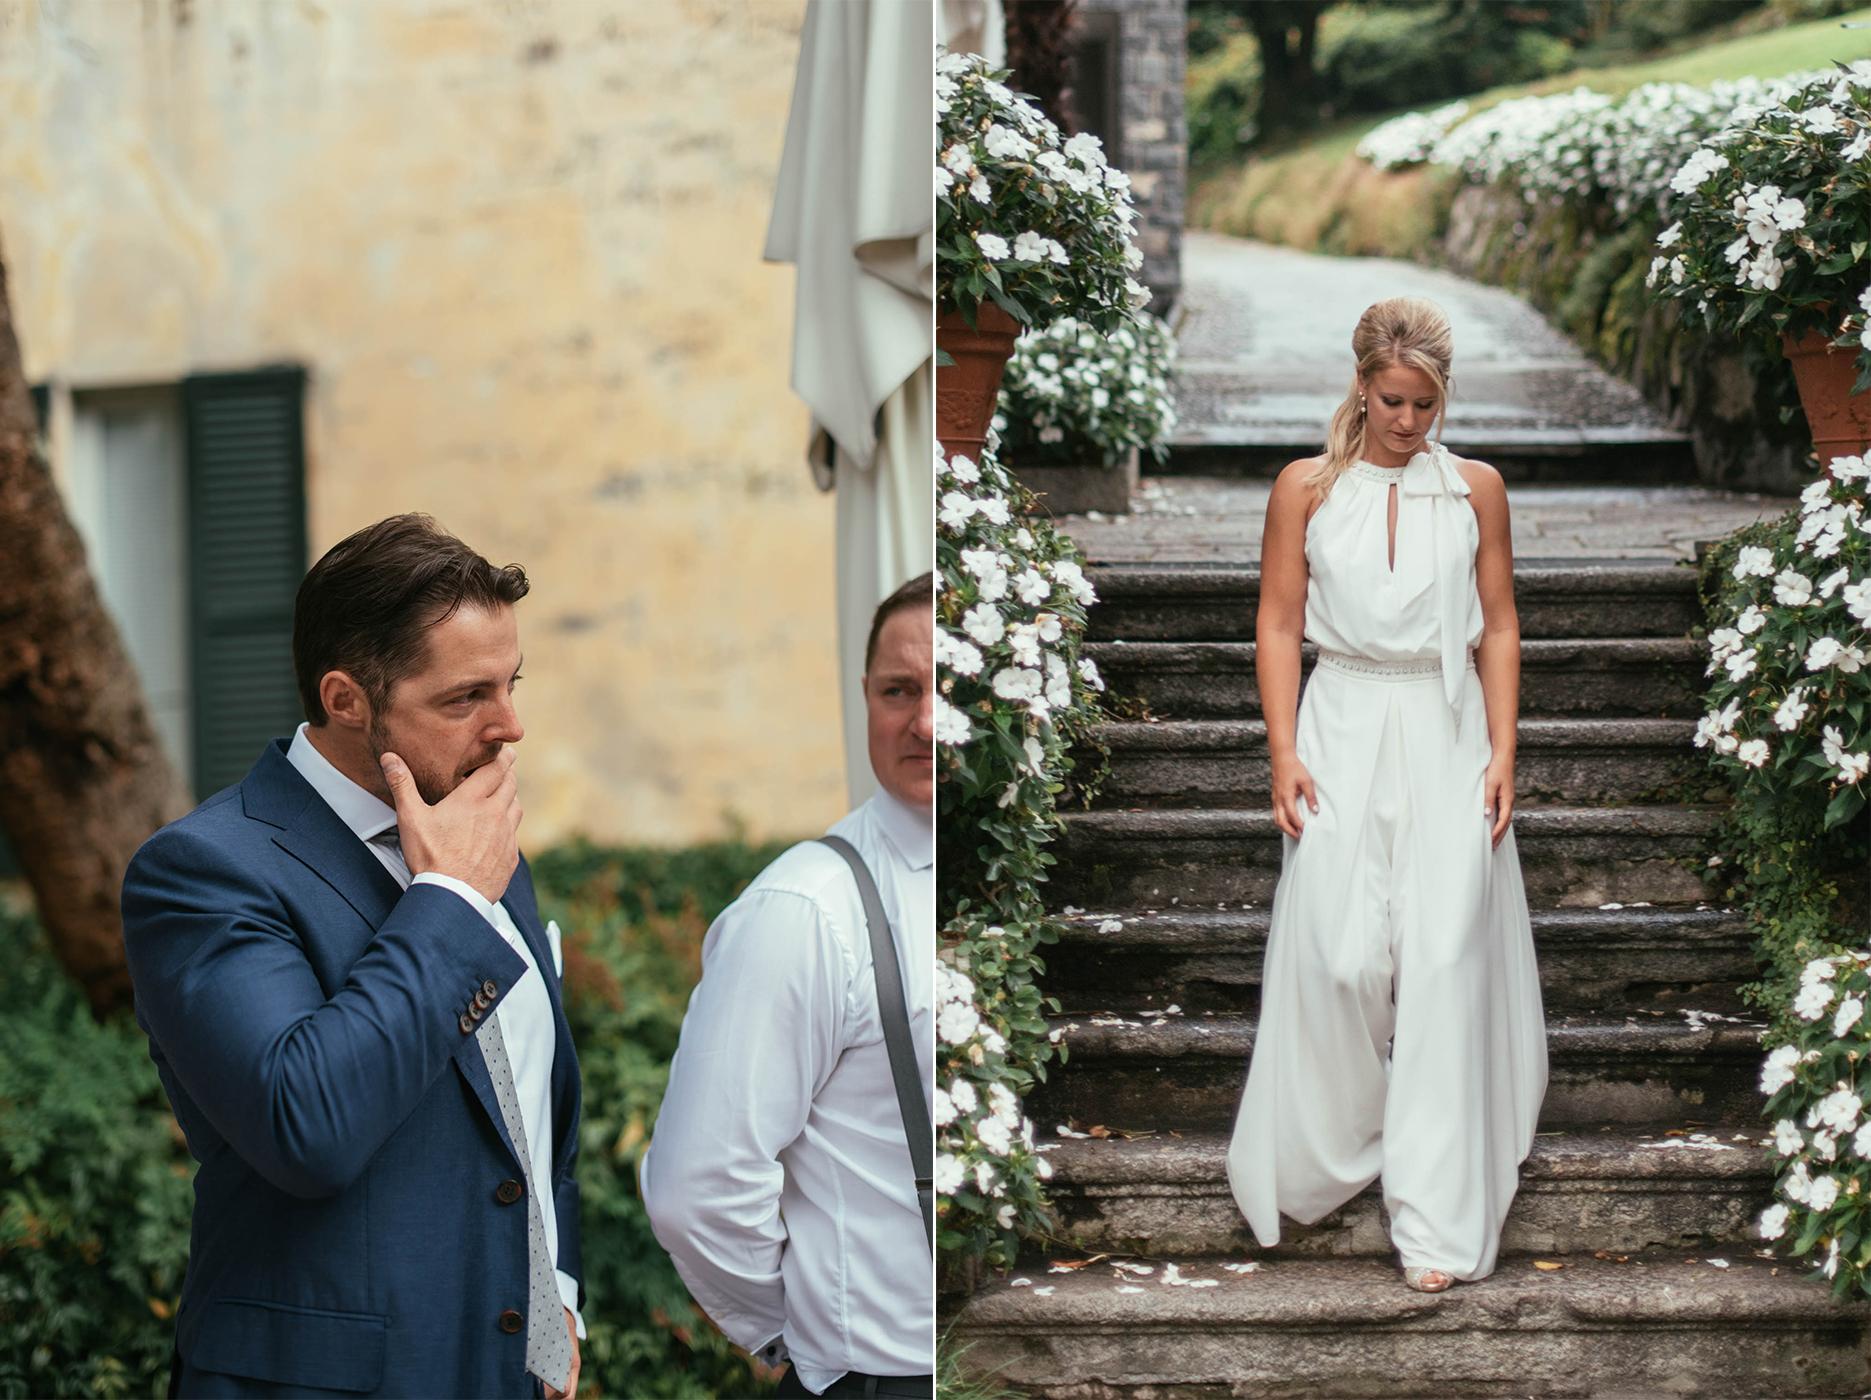 Real Wedding: Emma & James - Photography by Nisha Ravji